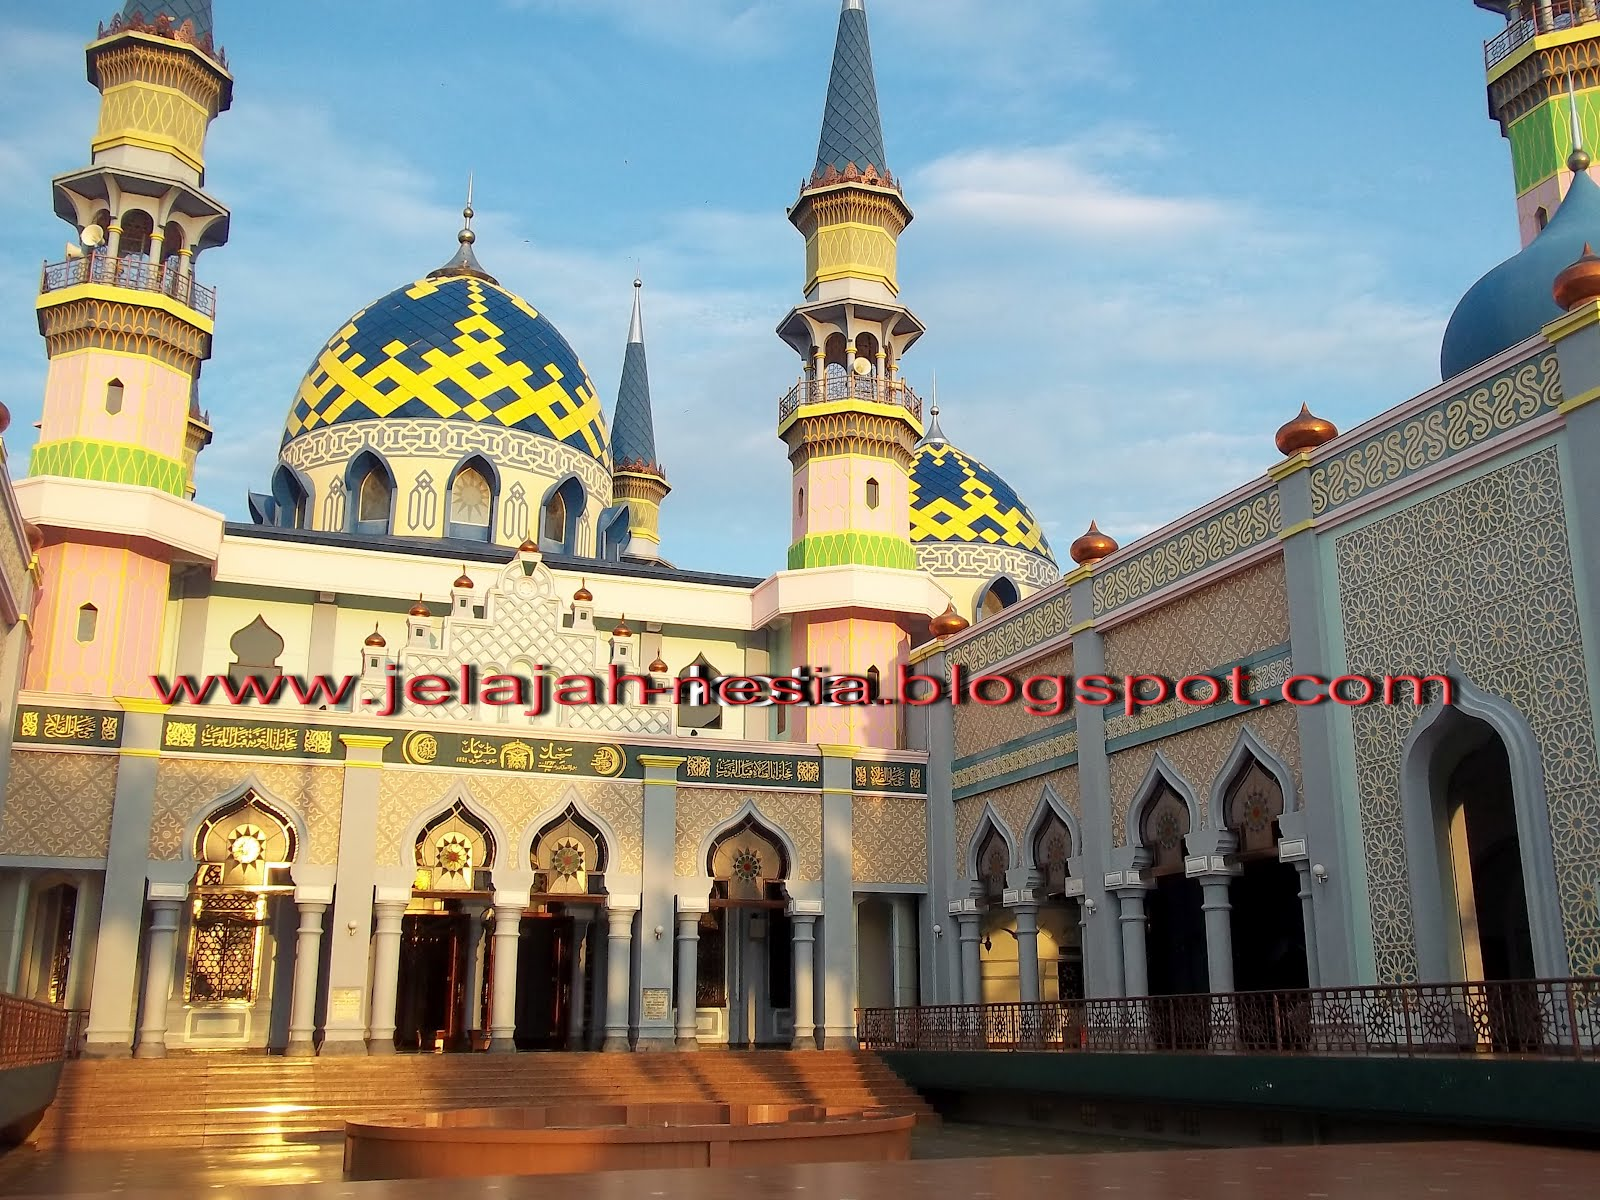 Www Jelajah Nesia Blogspot Pesona Keindahan Masjid Agung Tuban Sebelumnya